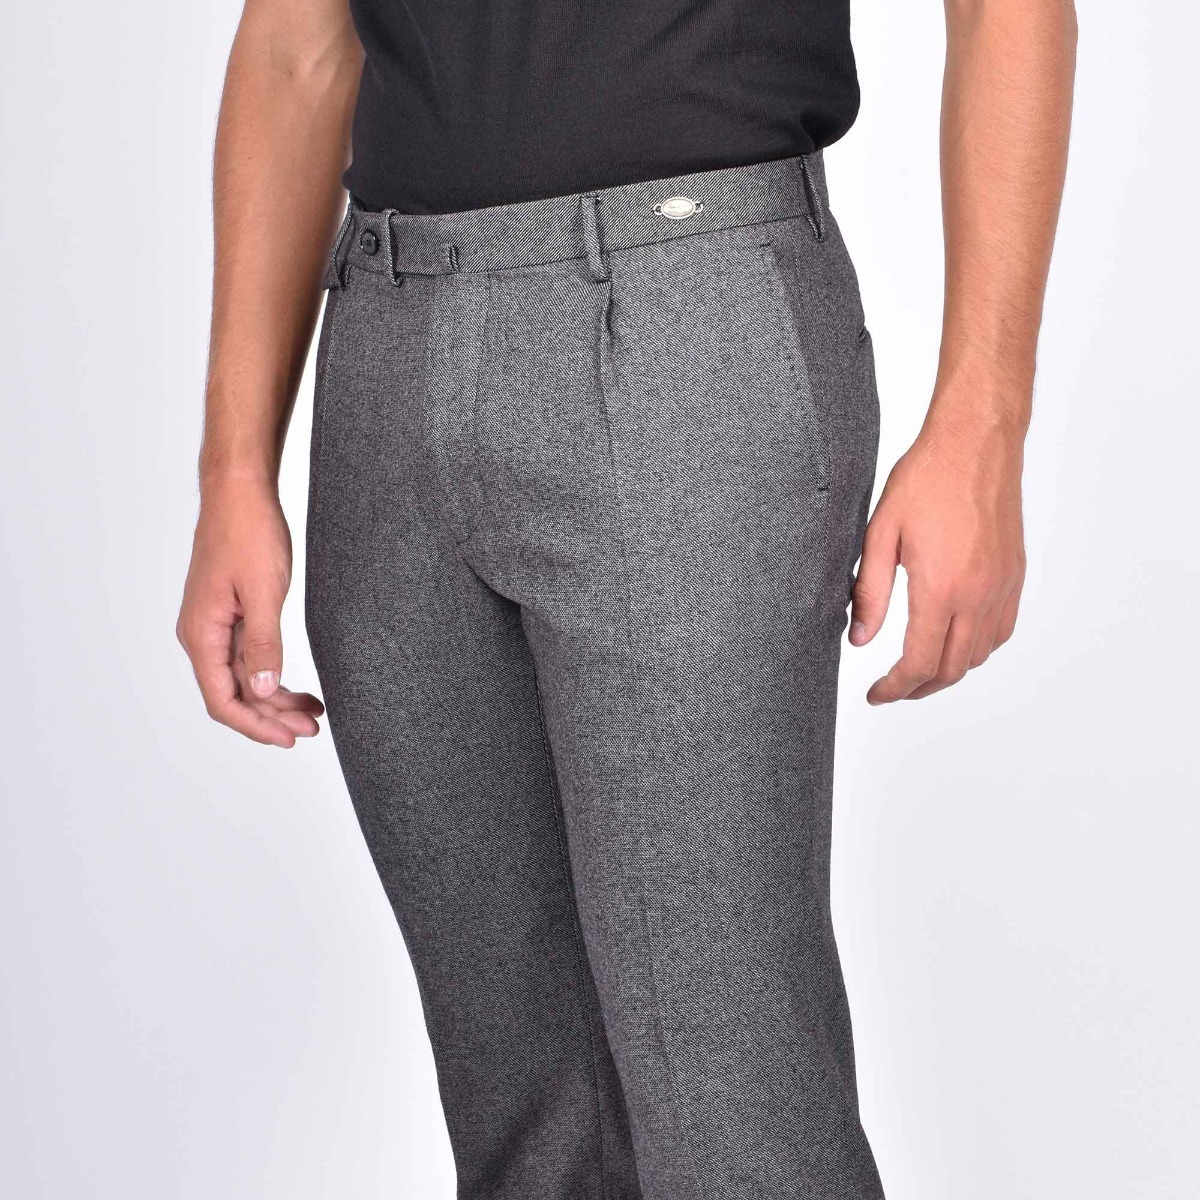 Pantalone tasca america- Grigio chiaro